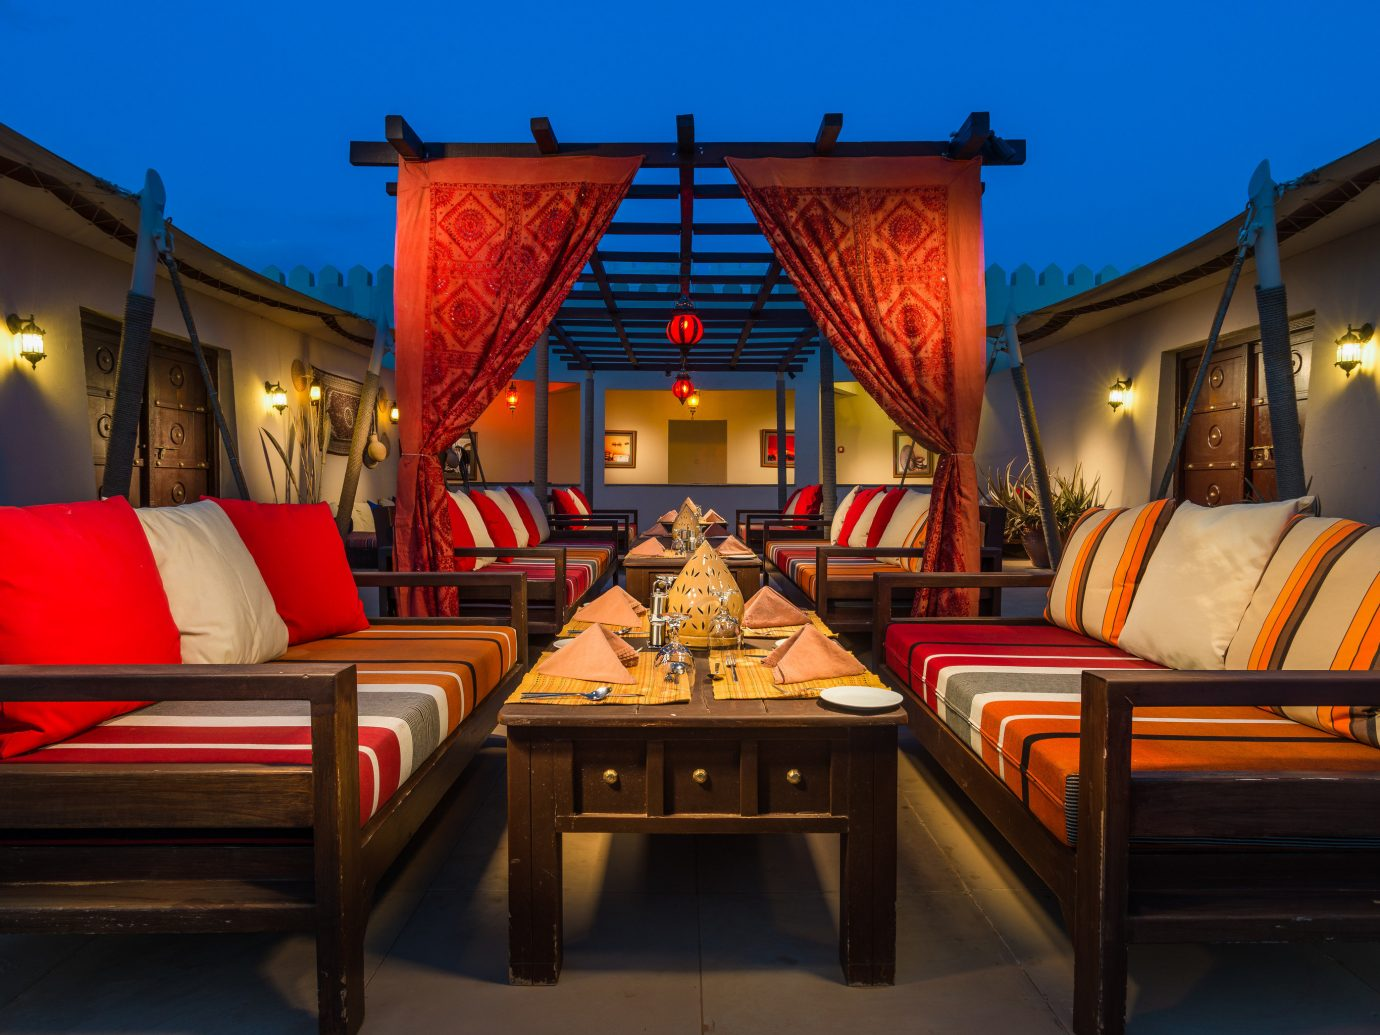 Trip Ideas lighting interior design furniture home estate table house